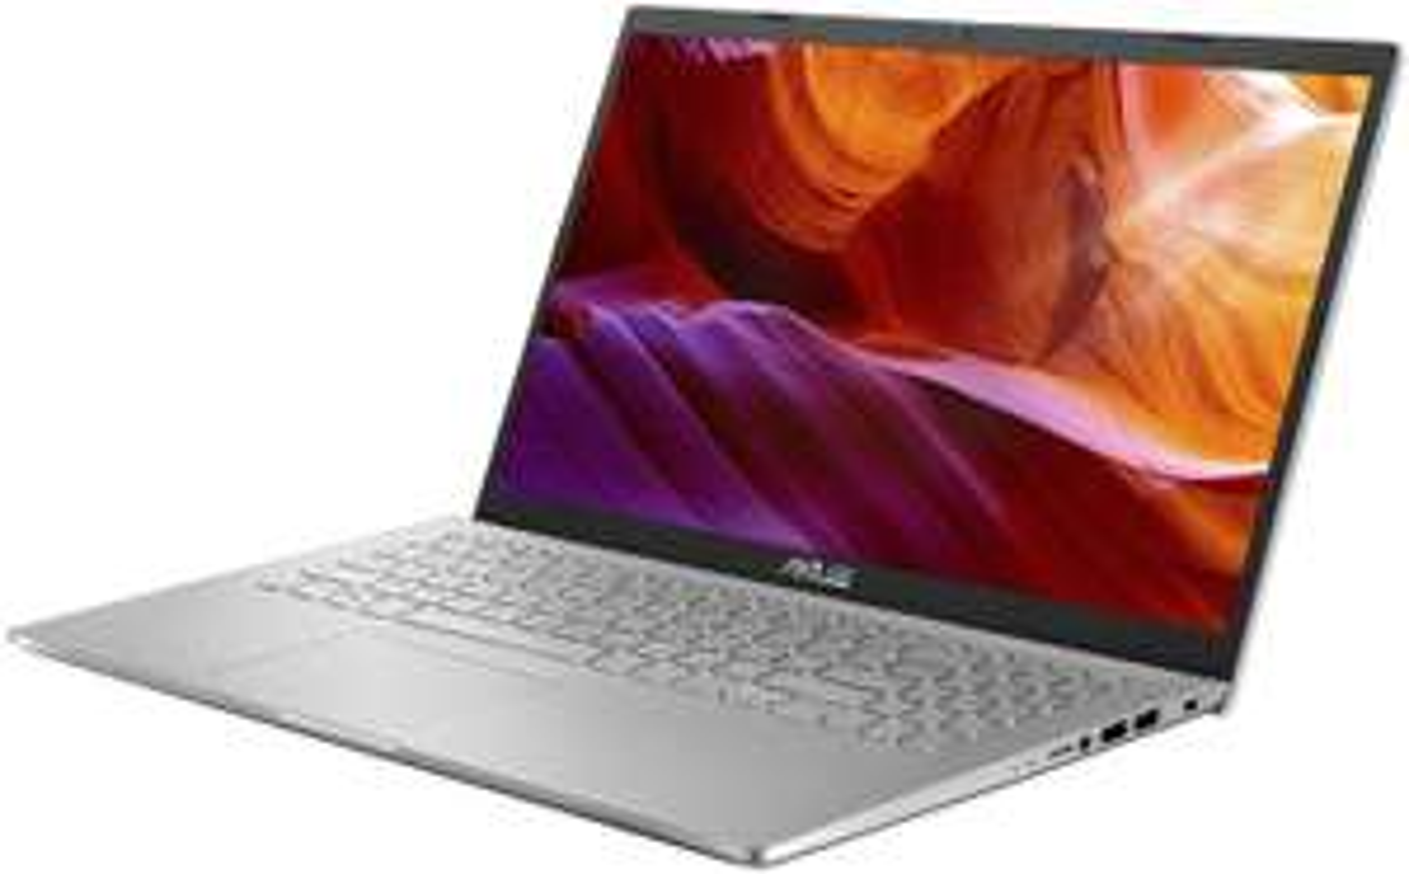 "ASUS AMD Ryzen 3 8GB RAM 256GB SSD 15.6"" HD IPS Laptop - £399.97 @ Box"